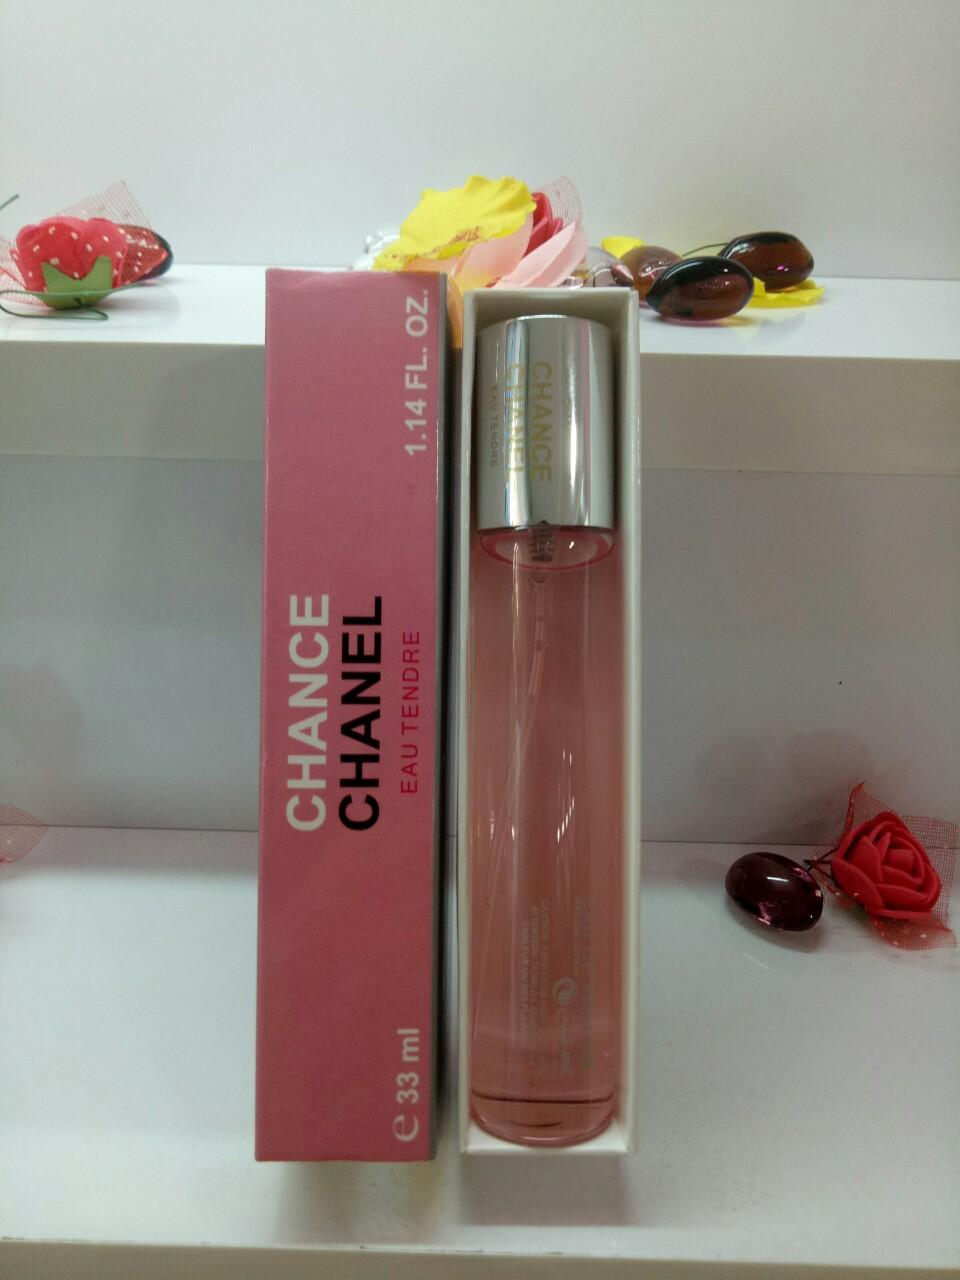 Nước Hoa Chance Chanel Eau Tendre 33ml